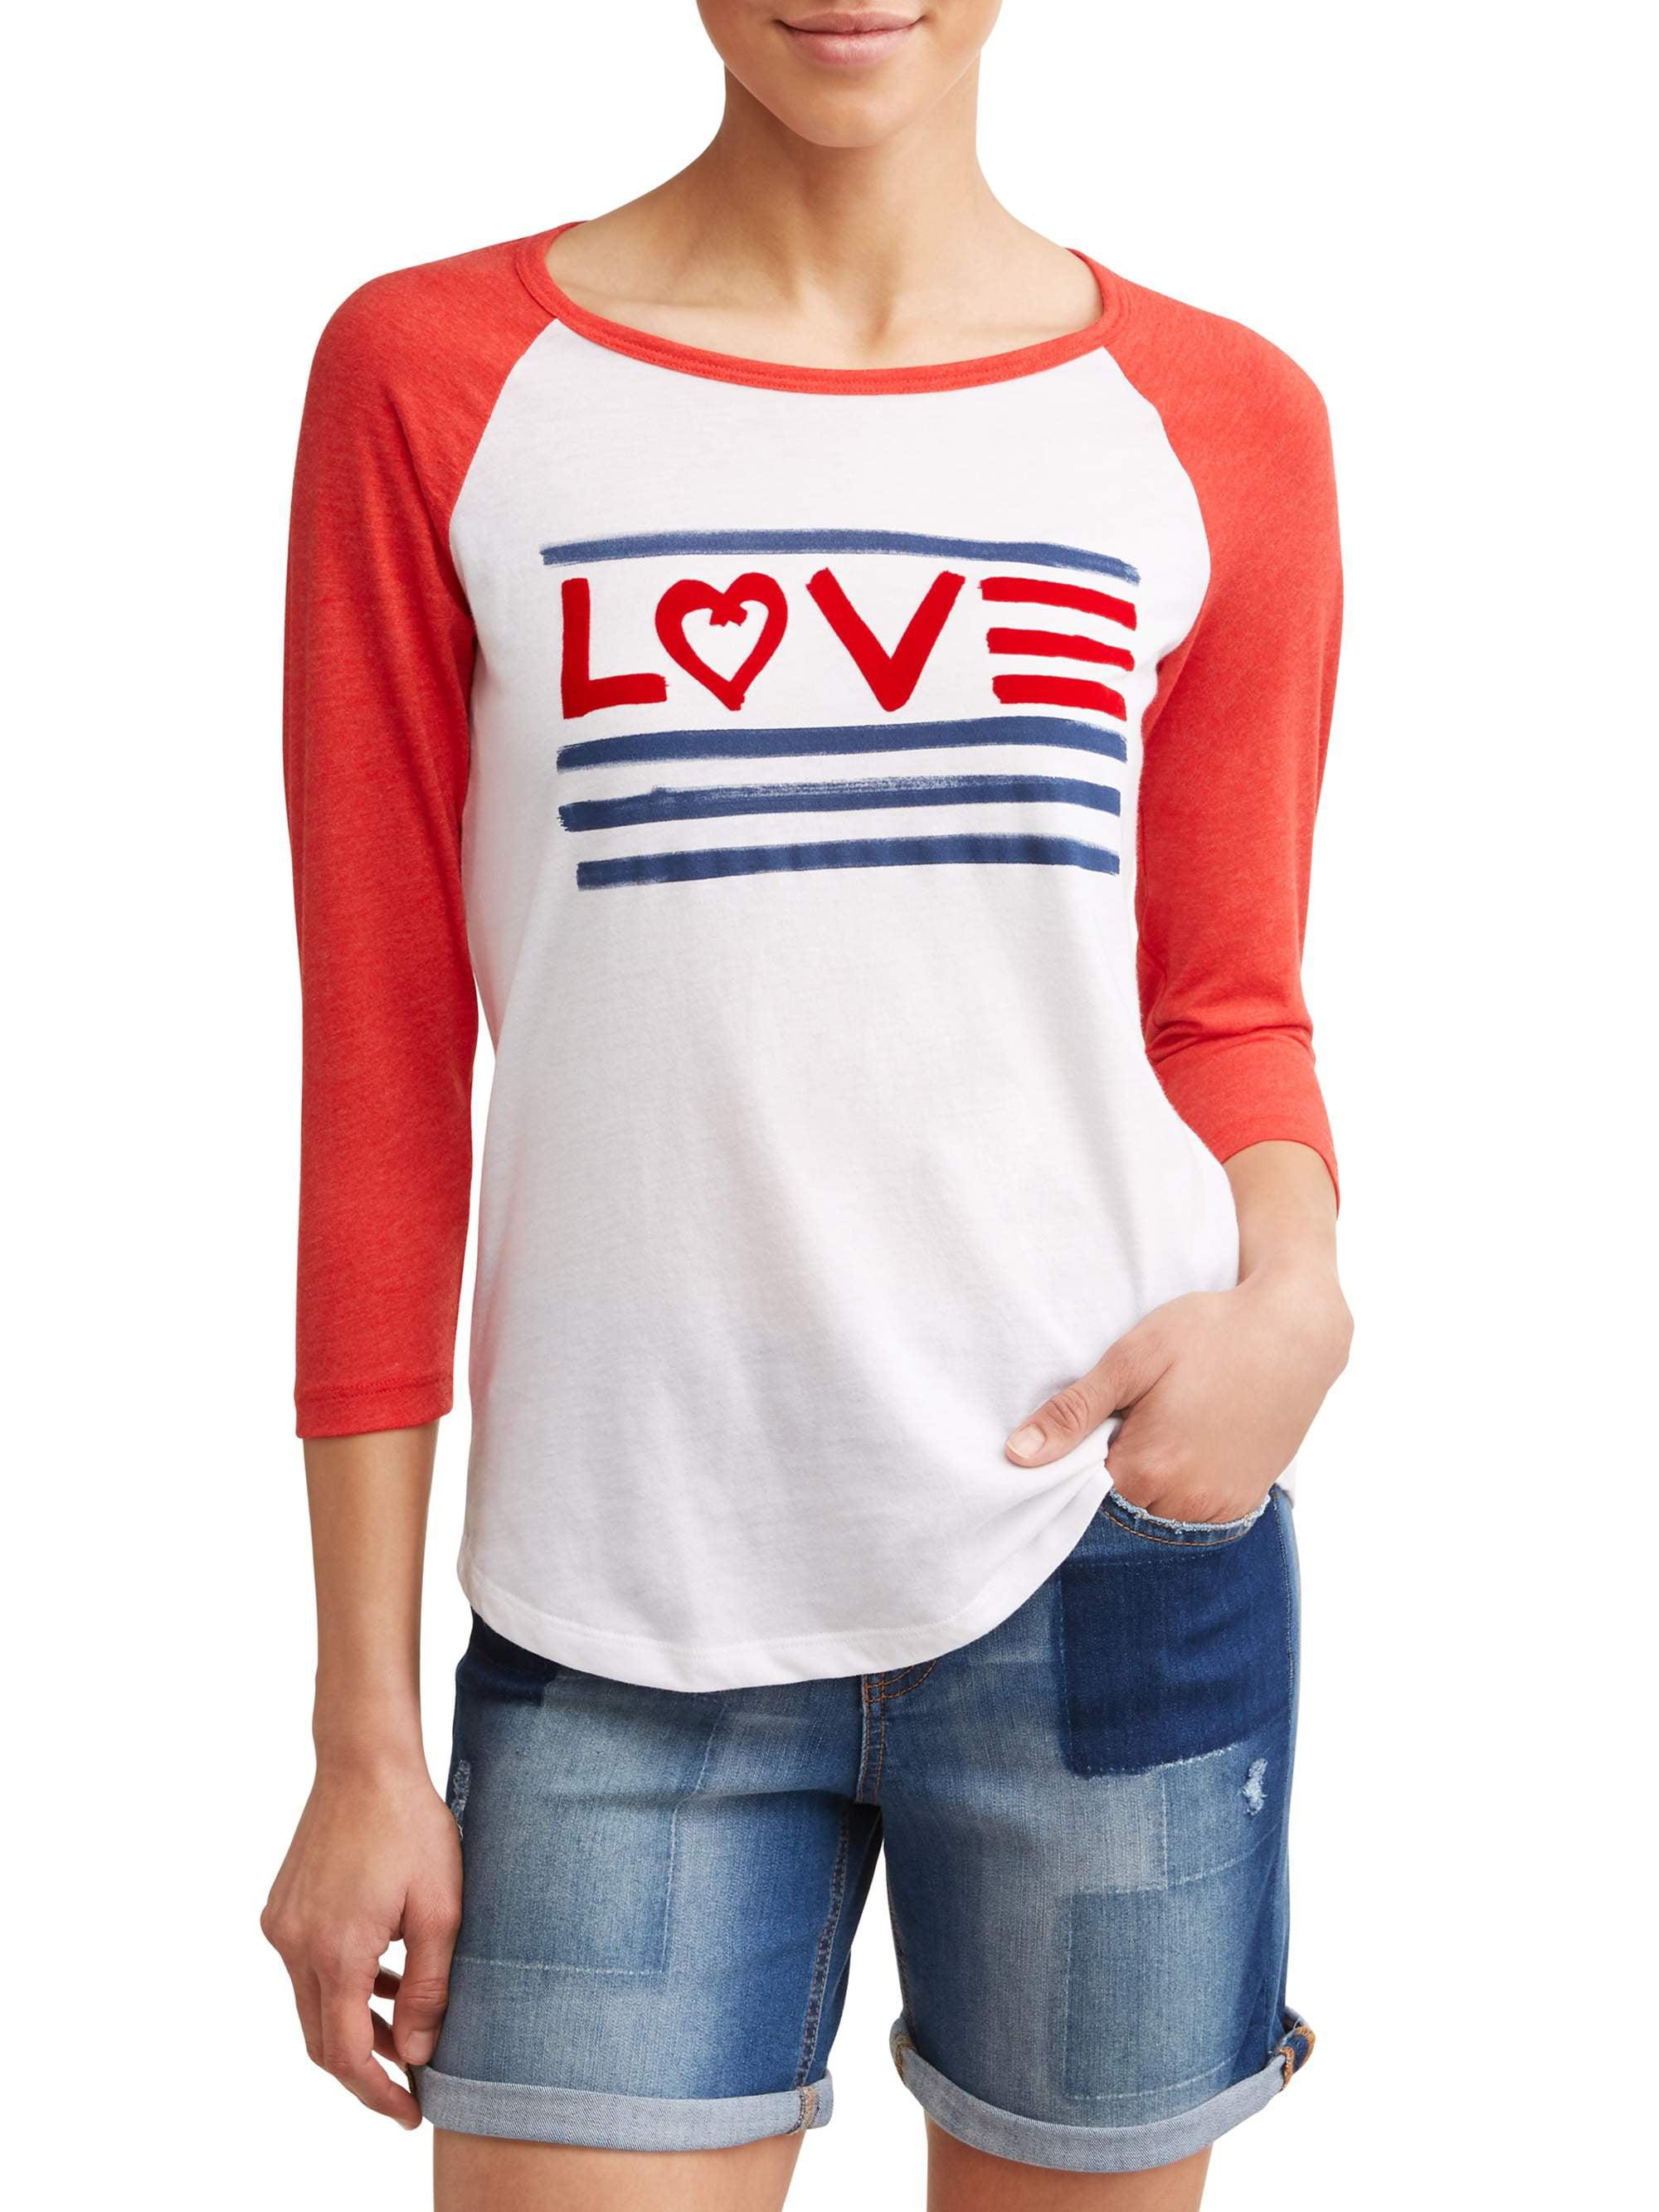 c947926b6 Ev1 From Ellen Degeneres - Love Flag 3/4 Sleeve Baseball Graphic Tee  Women's - Walmart.com